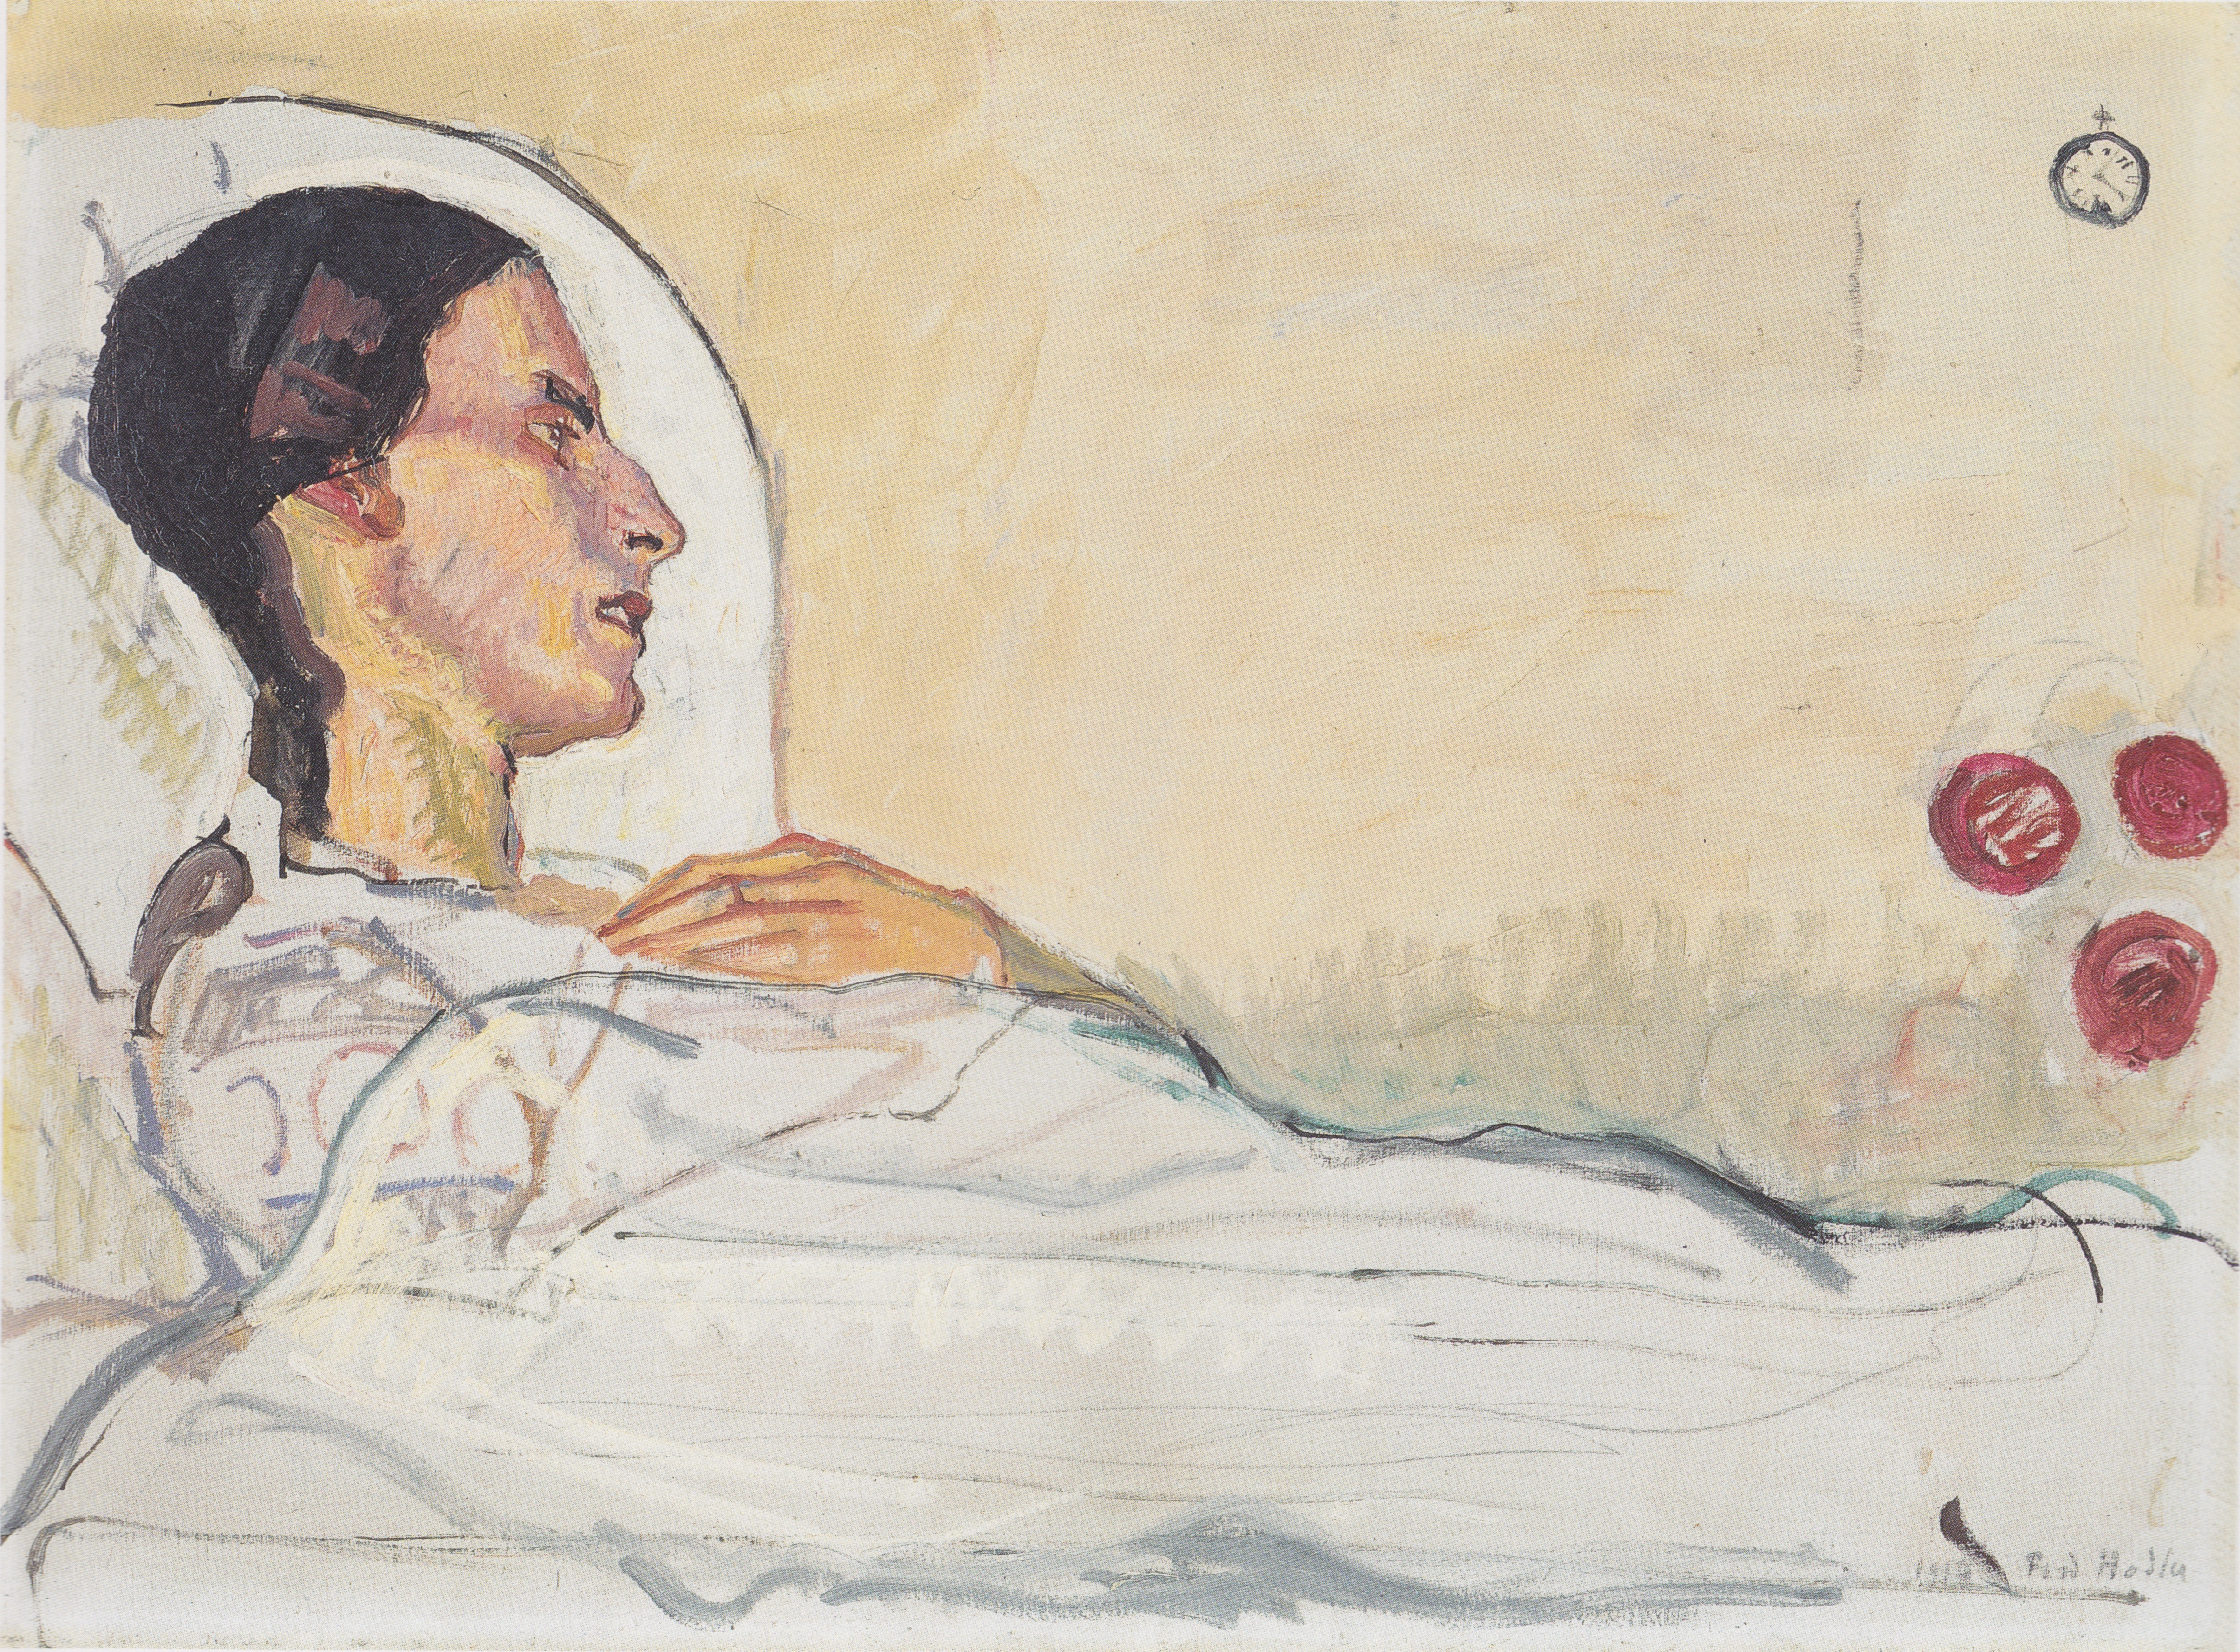 Hodler_-_Valentine_Godé-Darel_im_Krankenbett_-_1914.jpeg